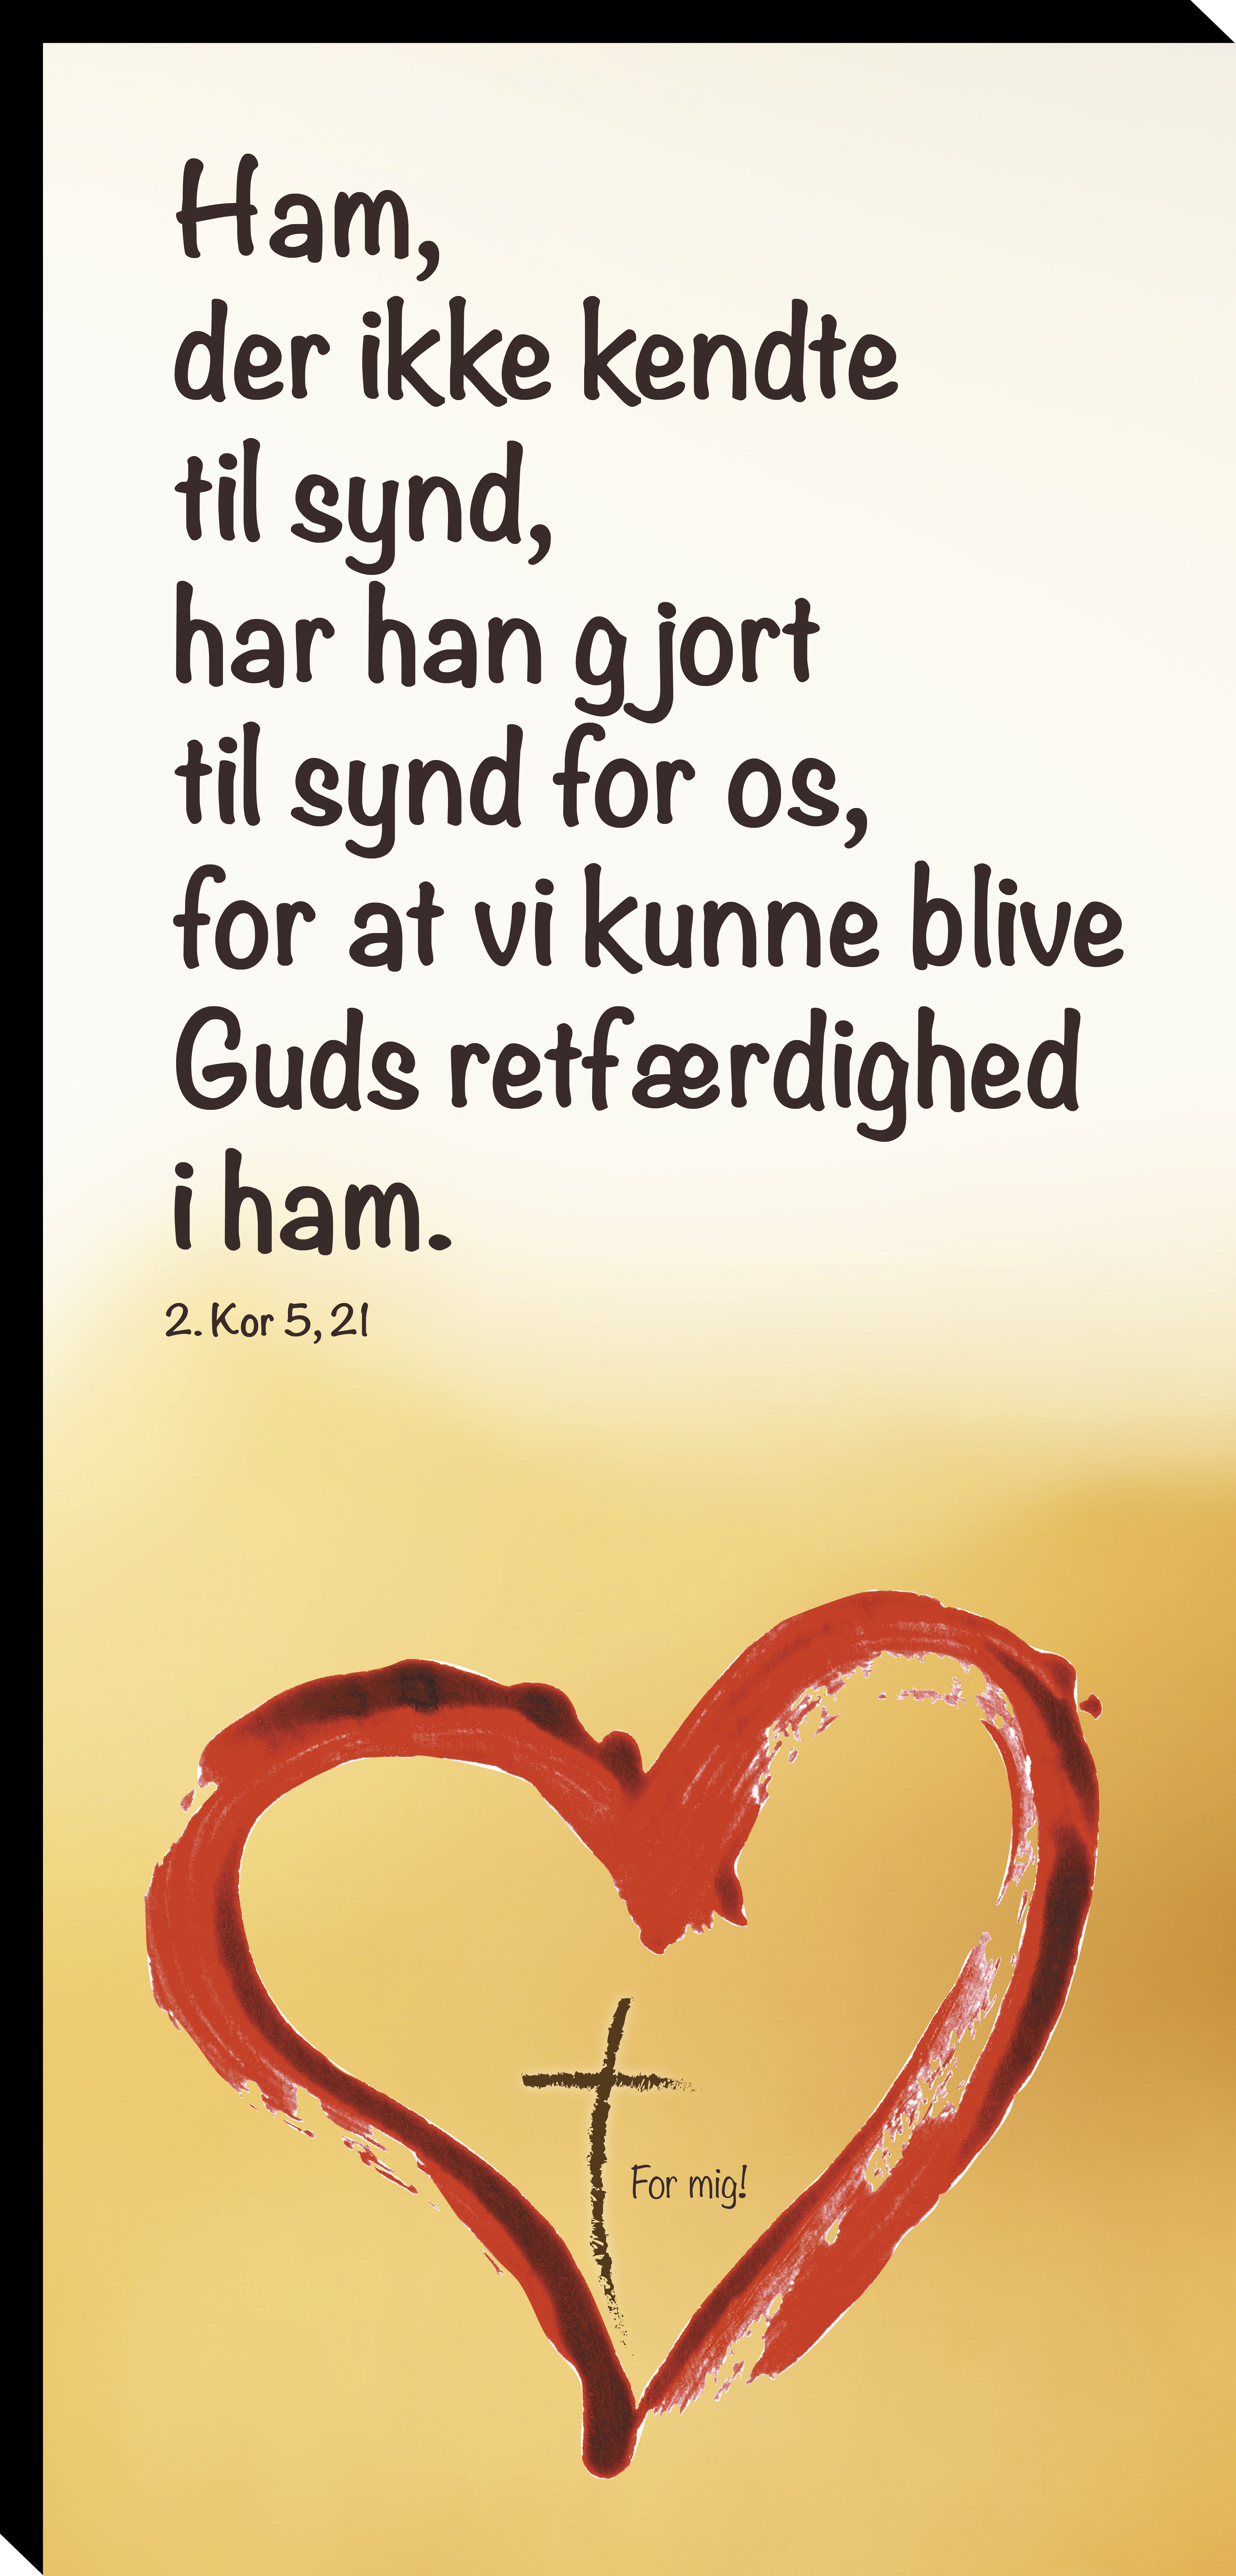 2. Kor 5, 21 Image